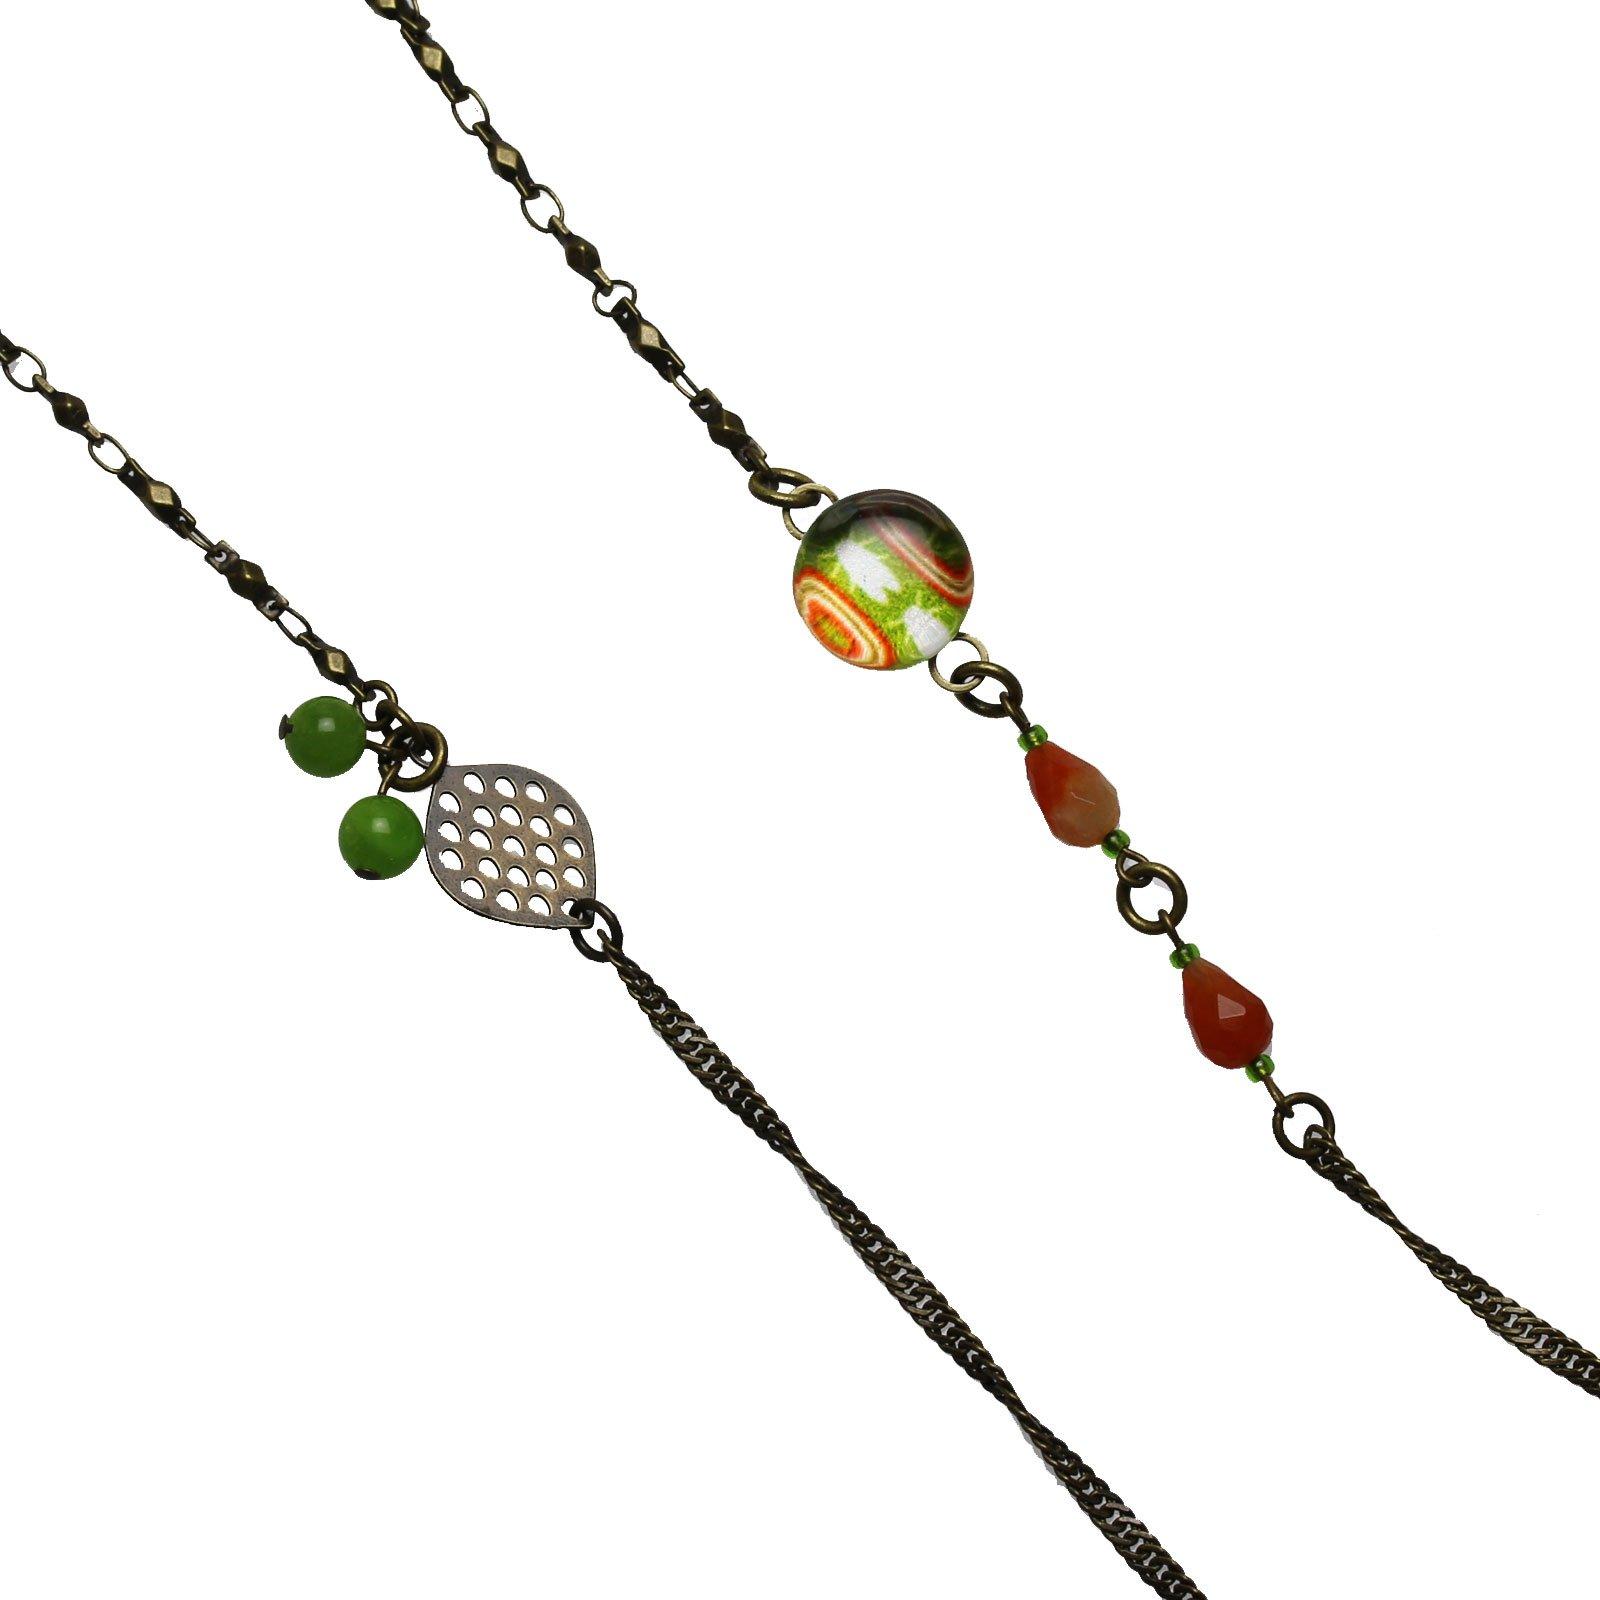 Tamarusan Glasses Chain Cicada Green Carnelian Glass Cord Handmade